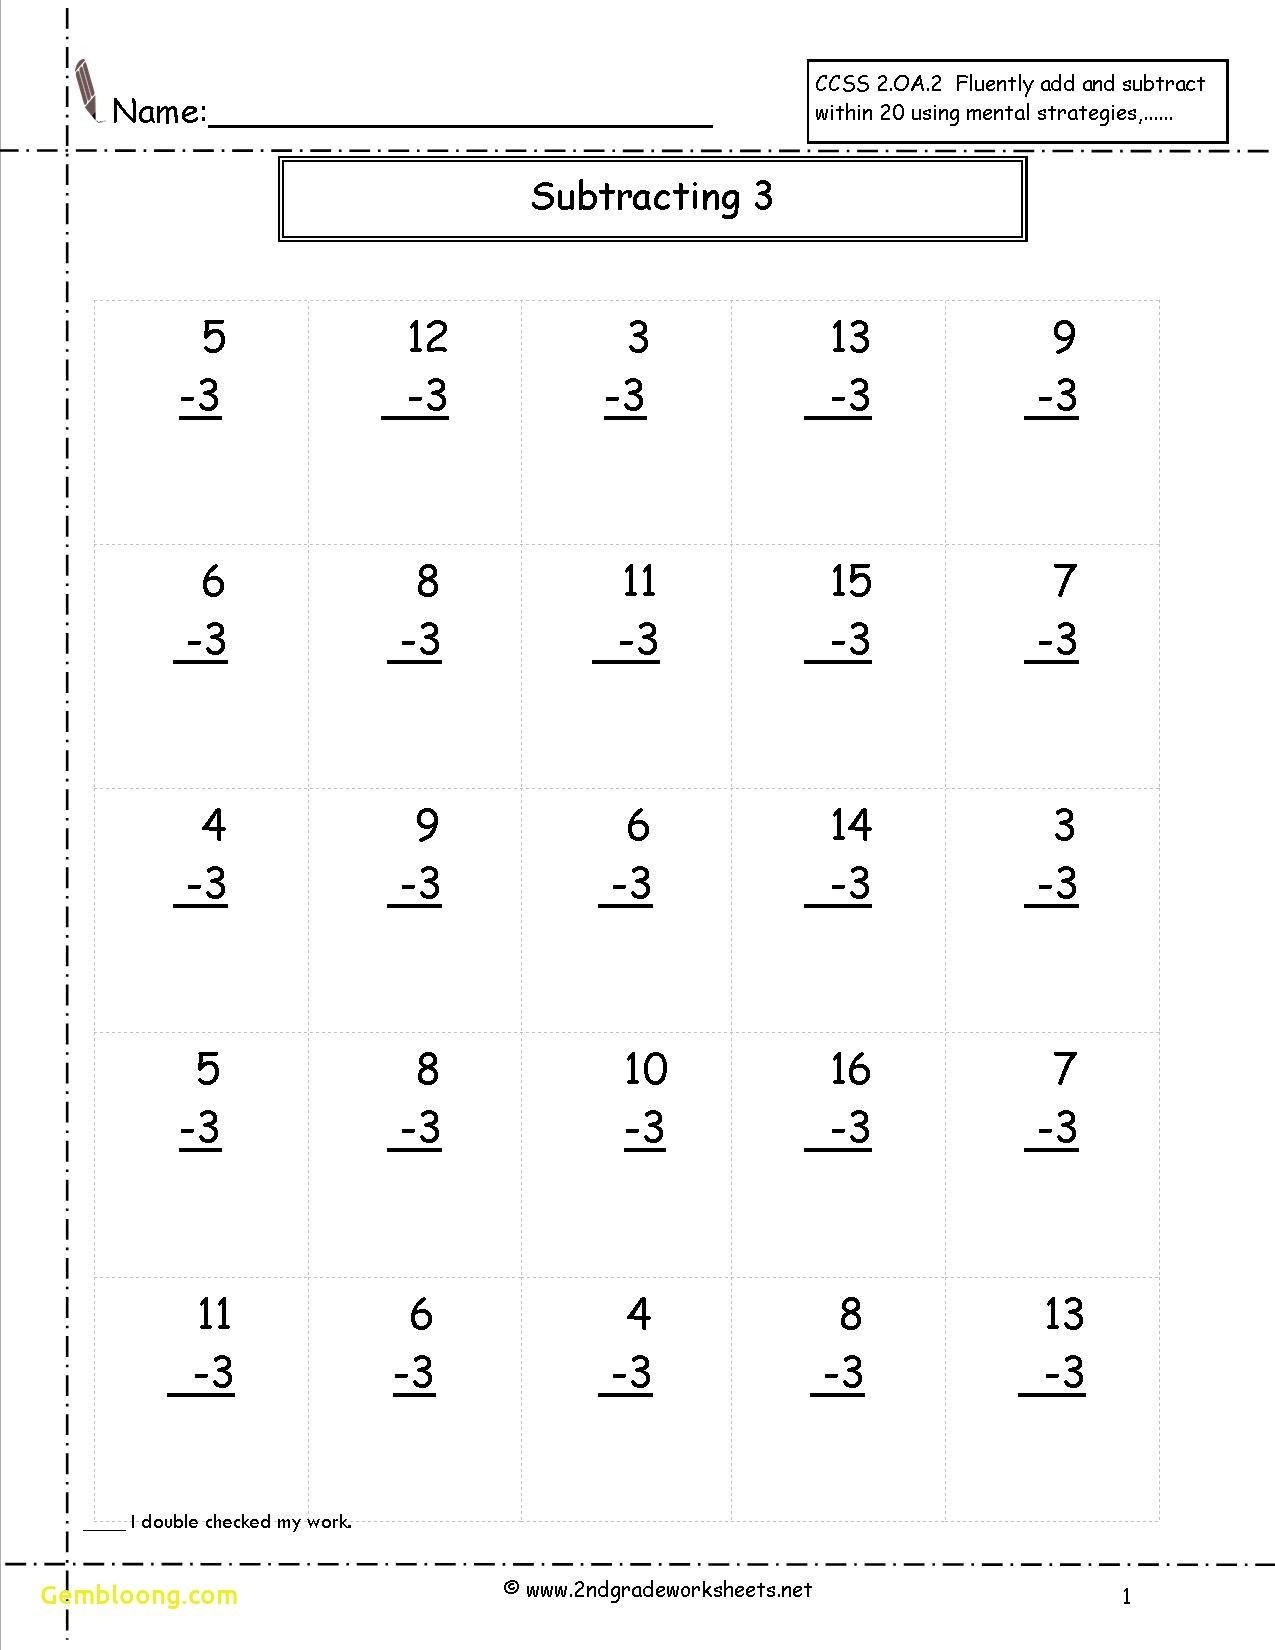 Official Money Addition Worksheets Worksheet Printable In 2020 Subtraction Worksheets Free Math Worksheets Math Worksheets